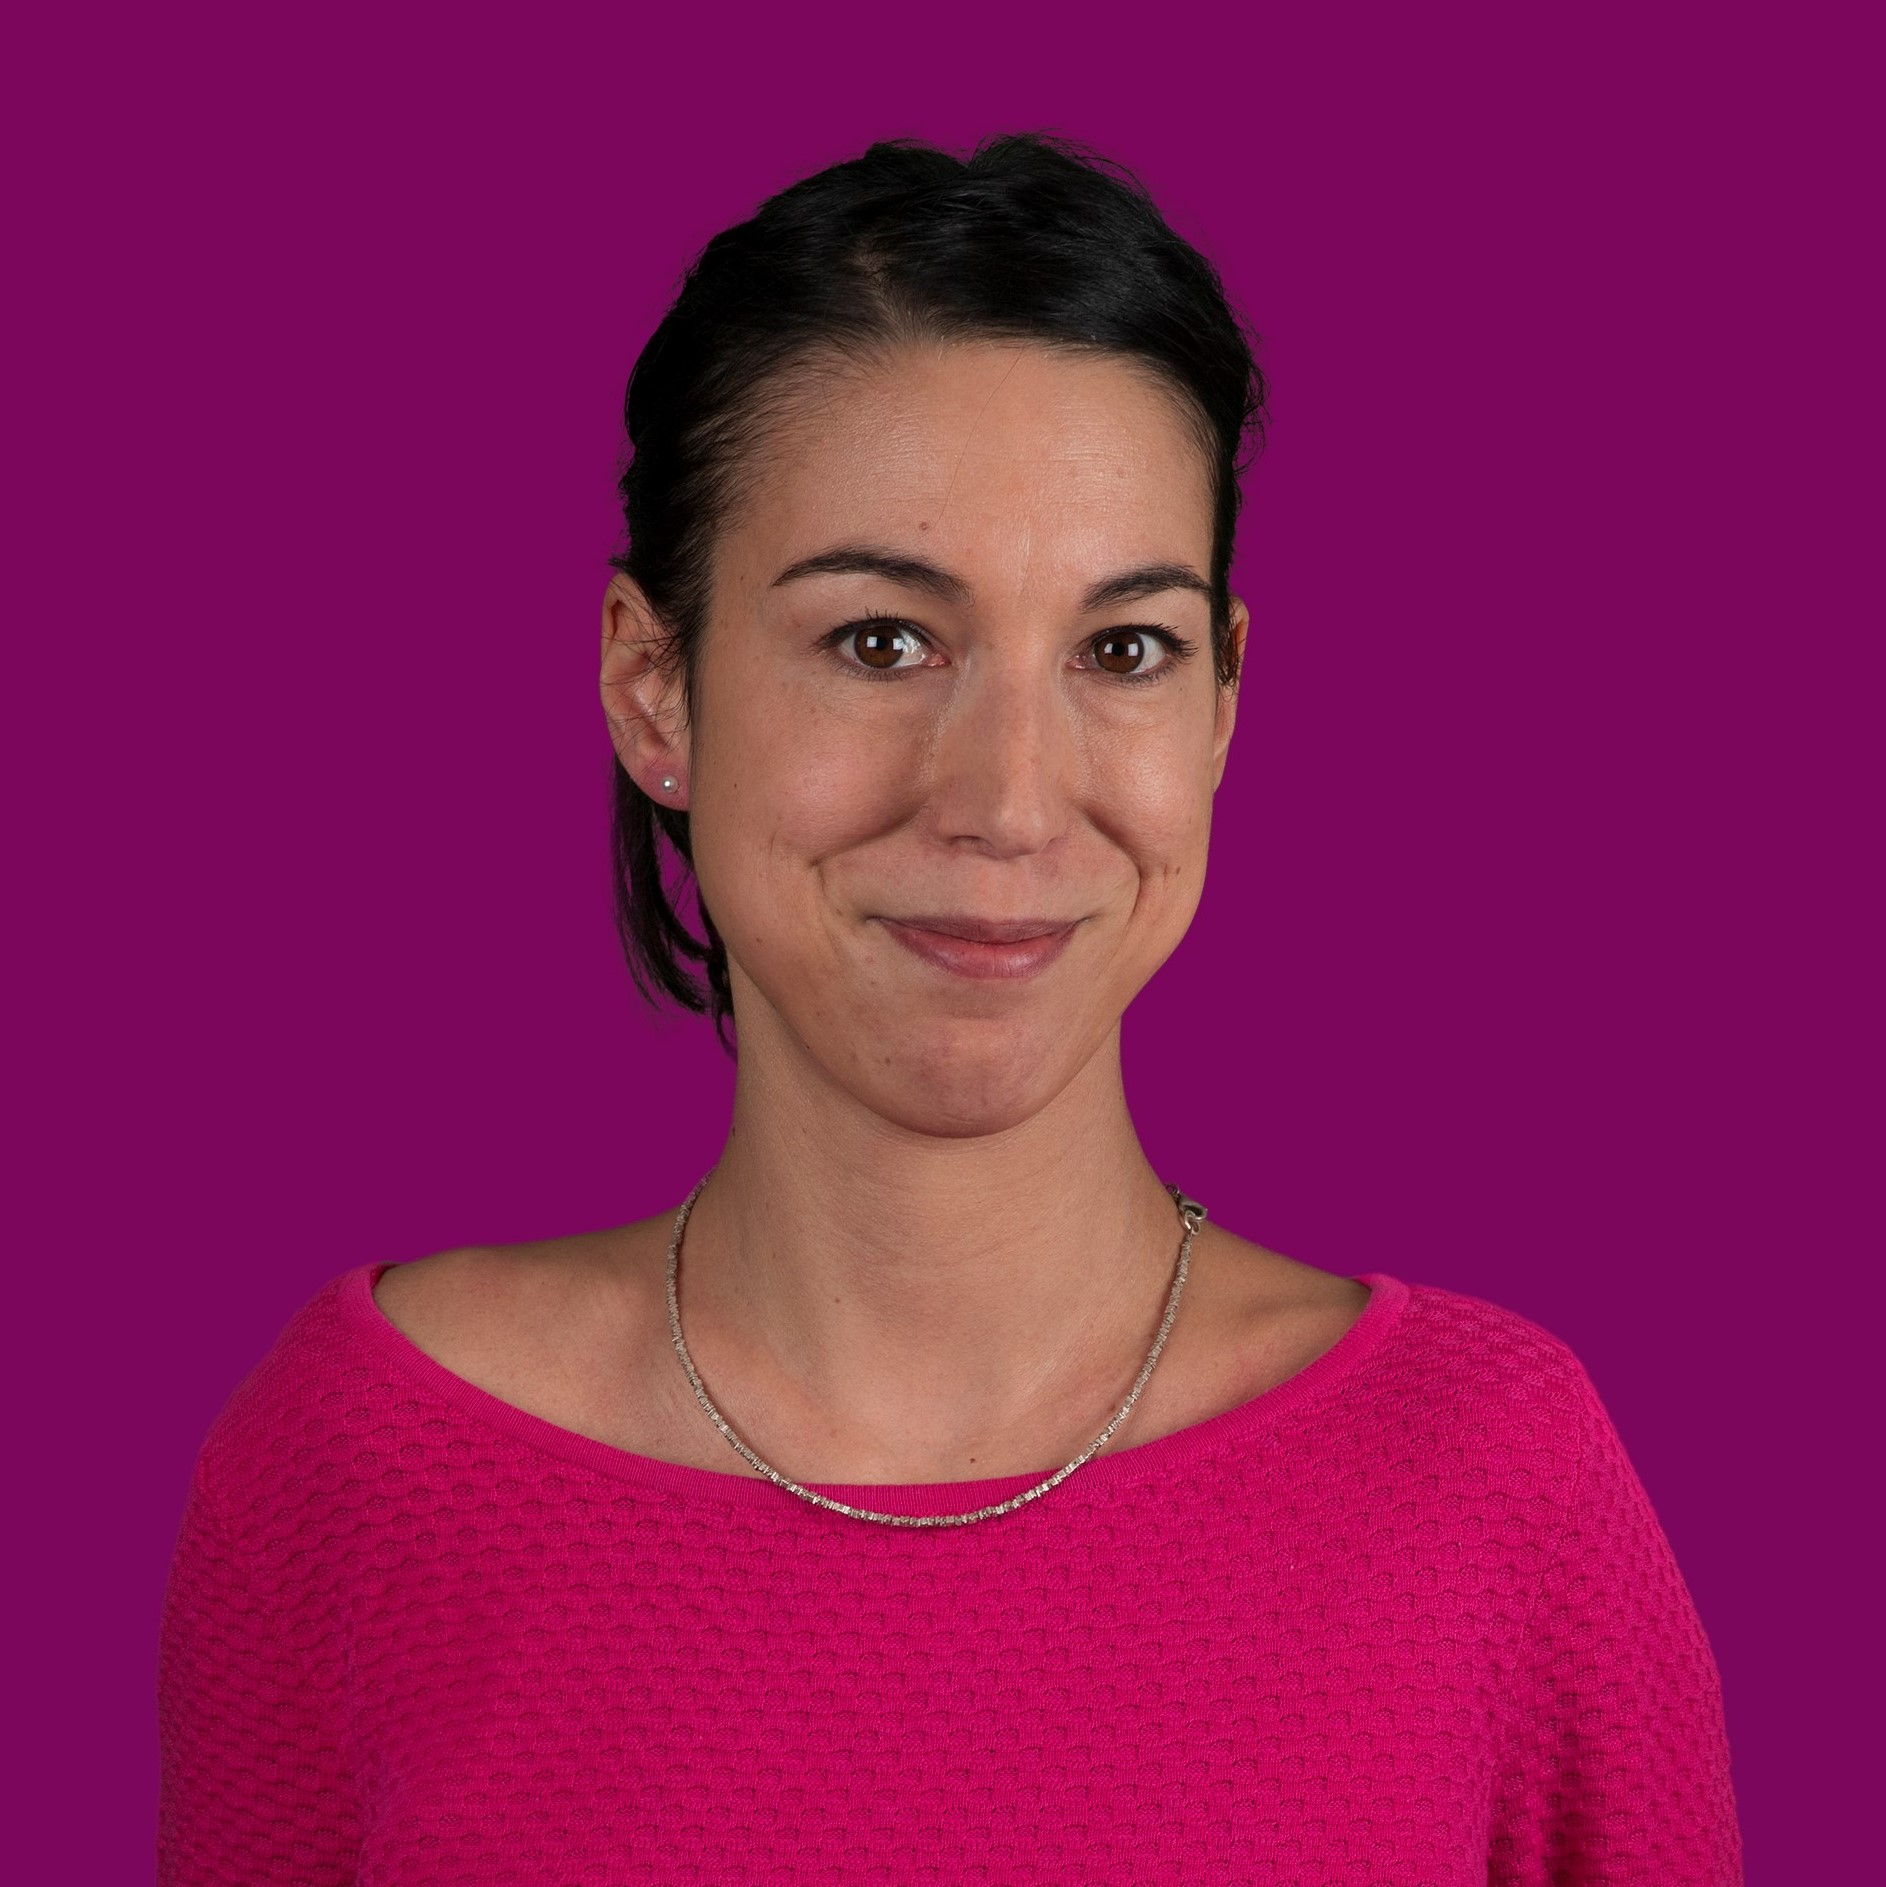 6. Audrey SCHMID